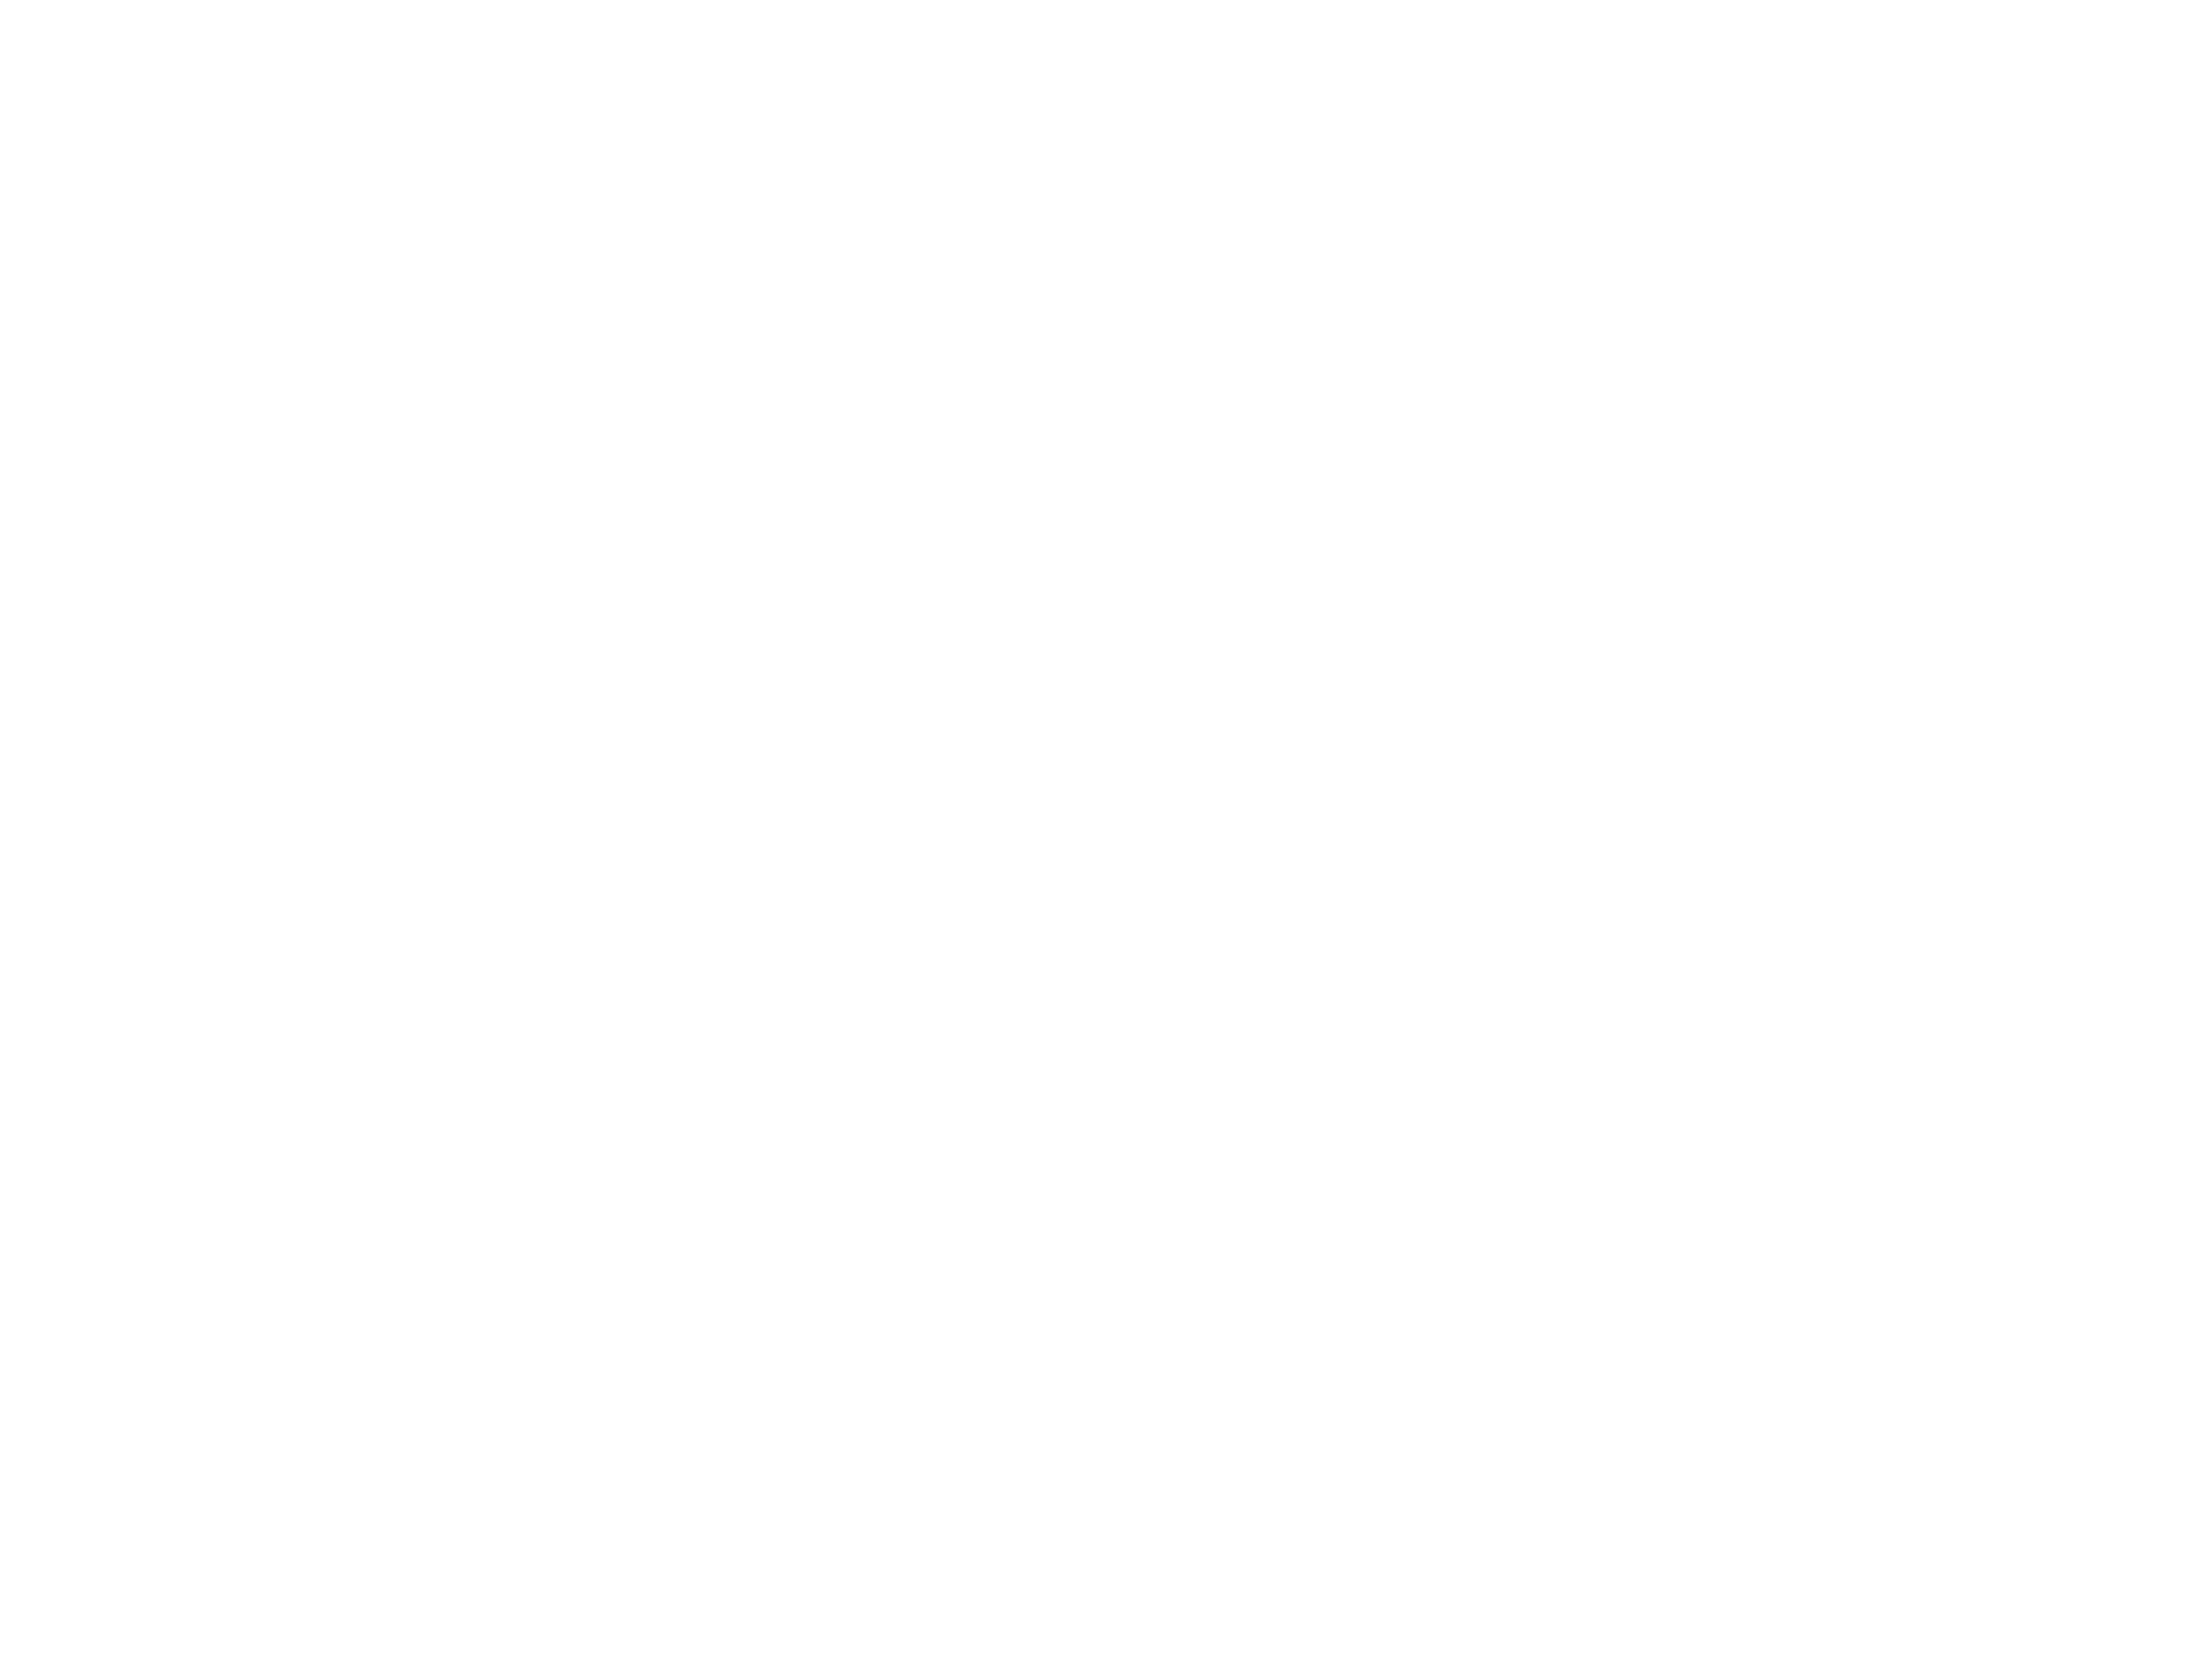 selectvisa-pte4